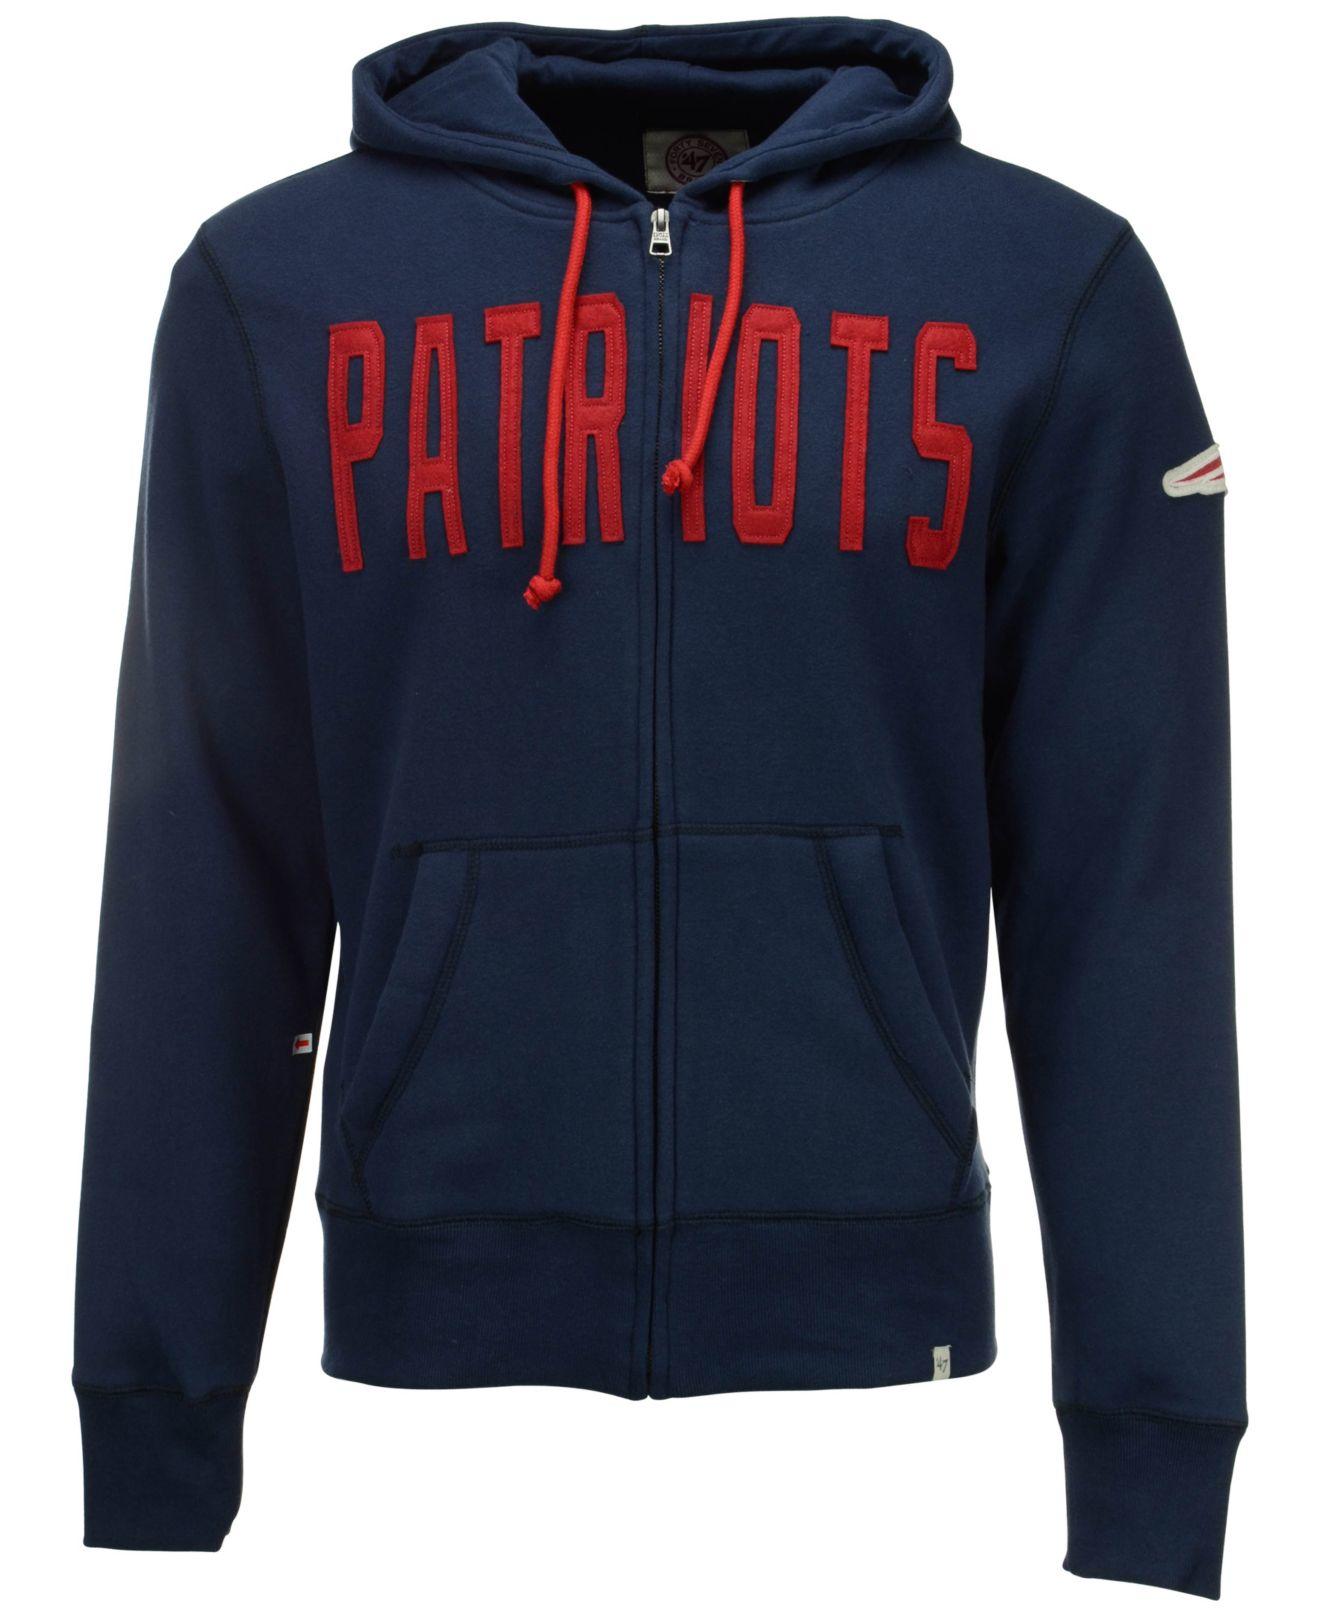 Lyst - 47 Brand Men s New England Patriots Cross Check Full-zip ... 1500a5b22